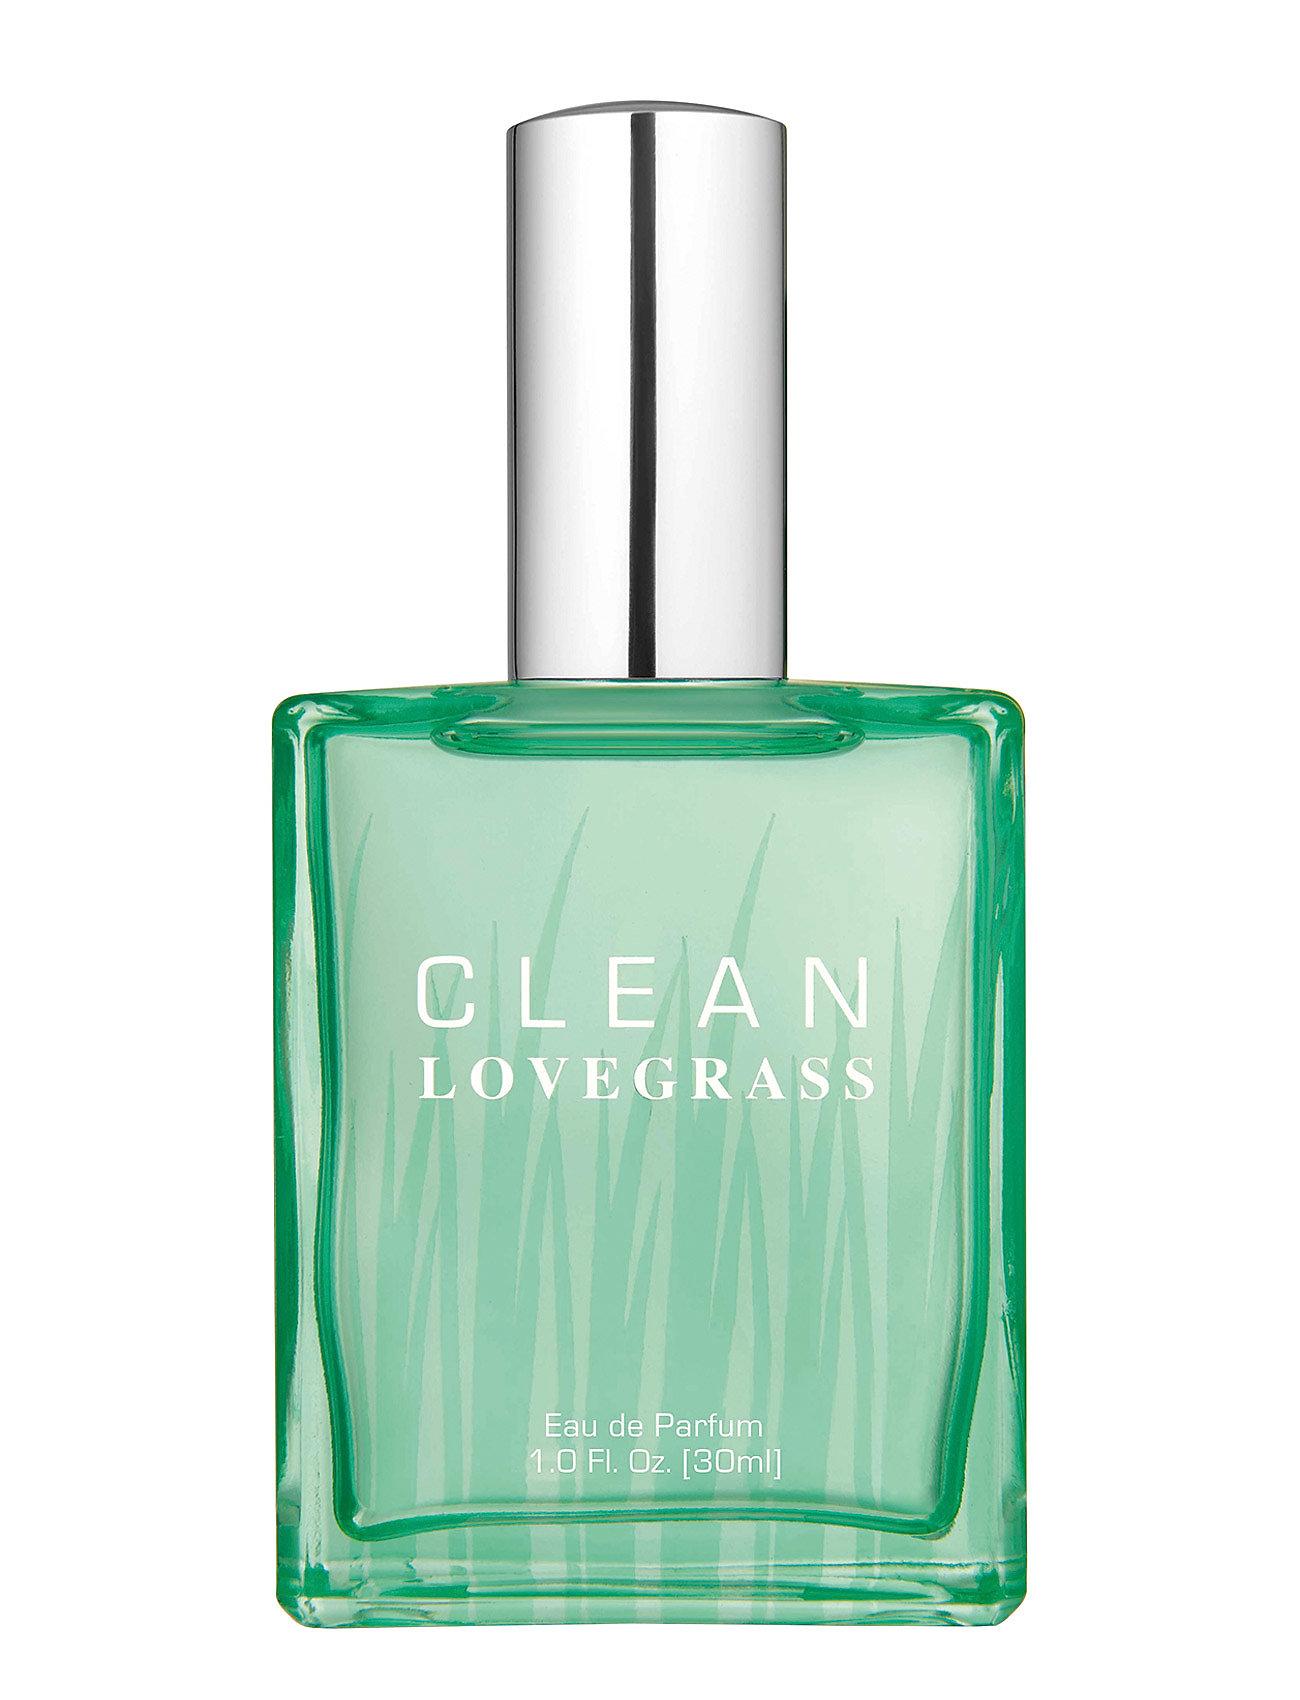 clean Love grass fra boozt.com dk